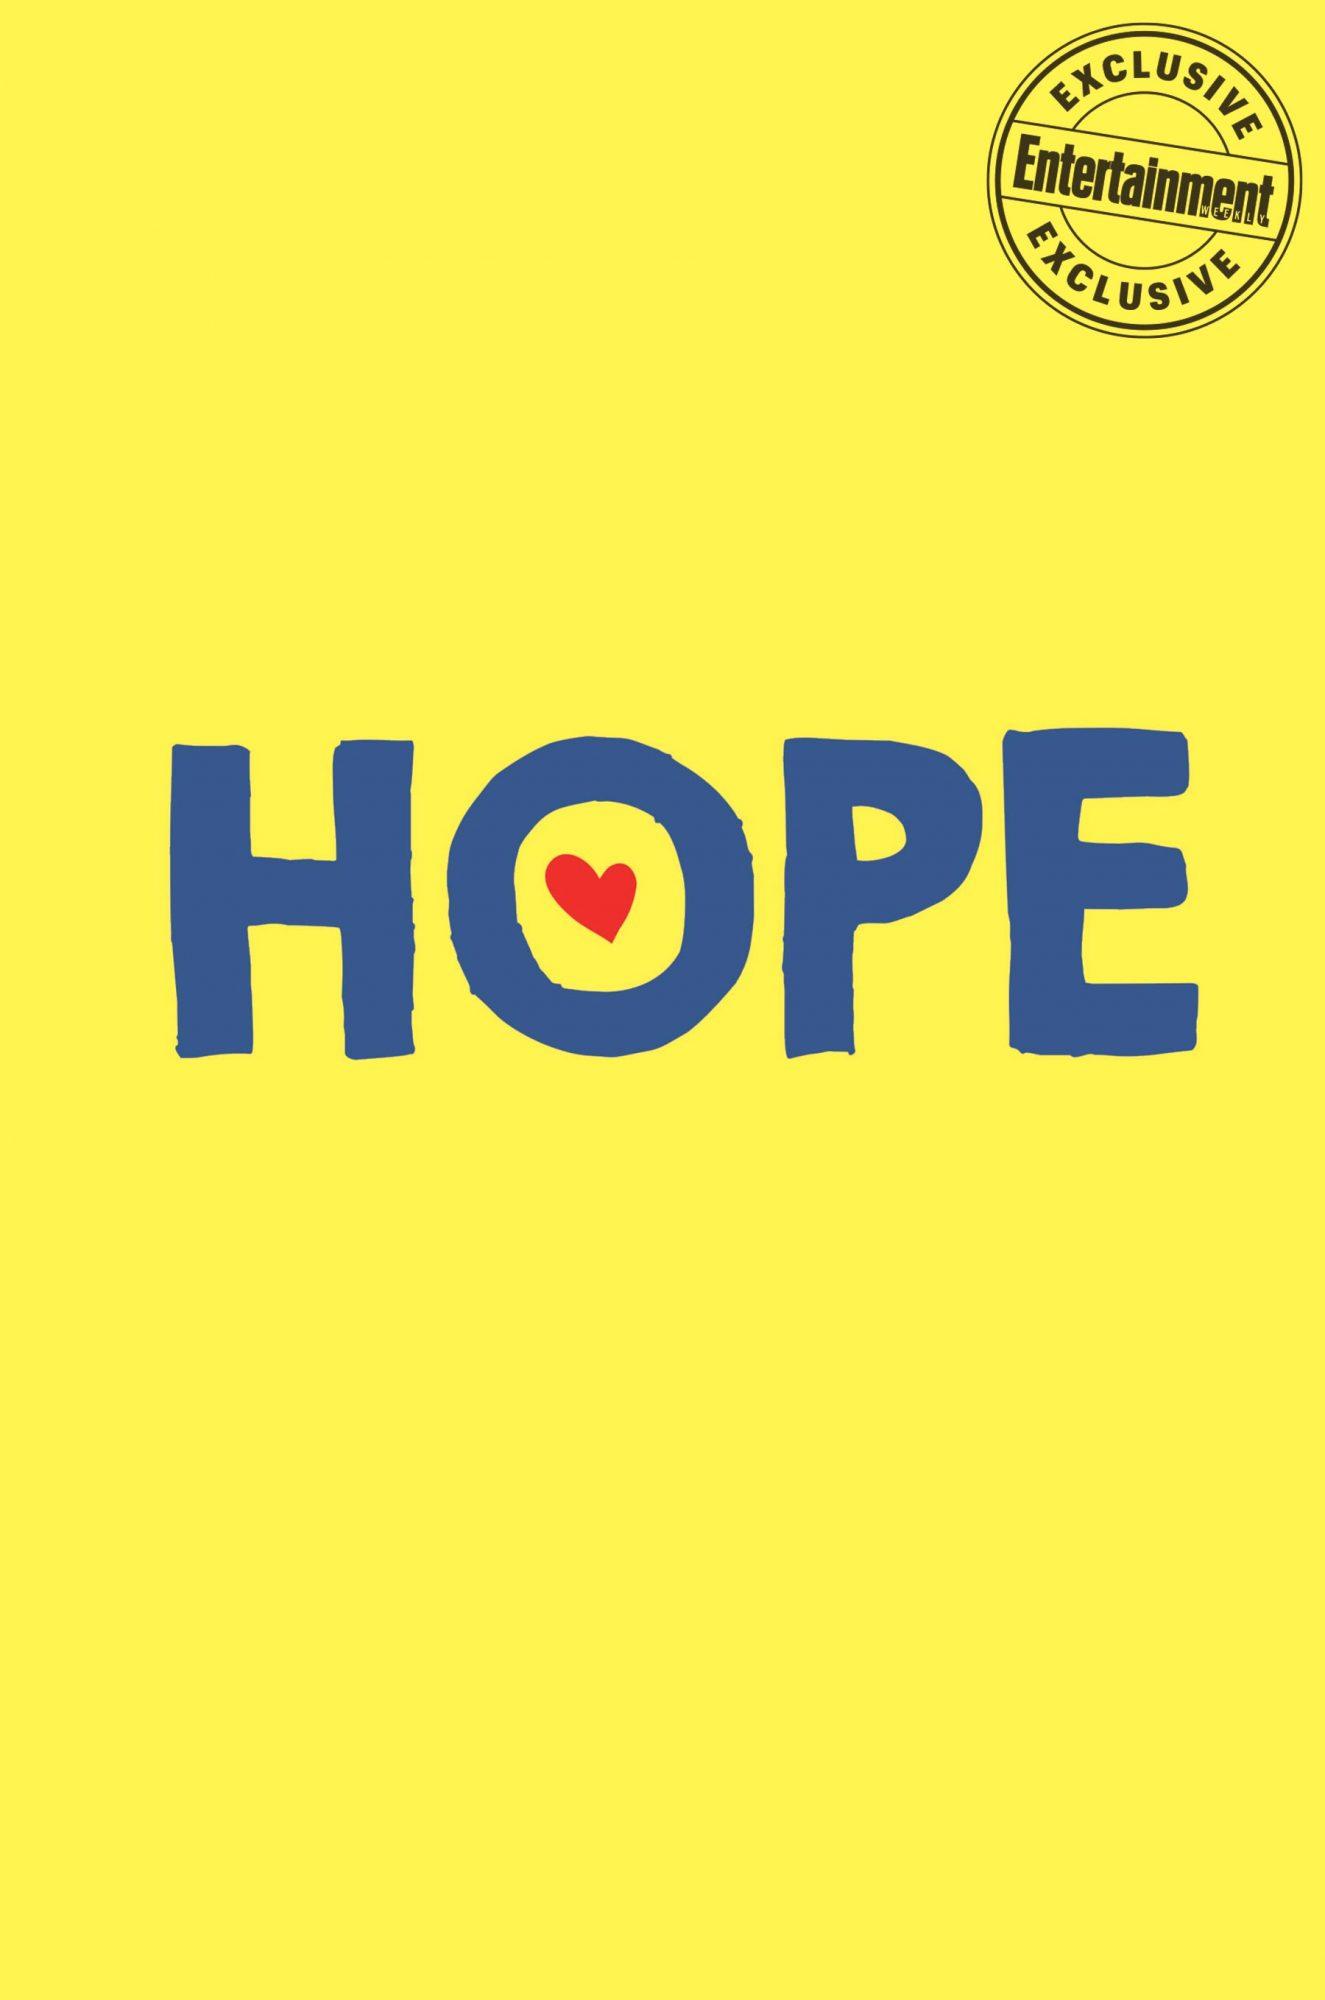 HOPE_logo-on-yellow